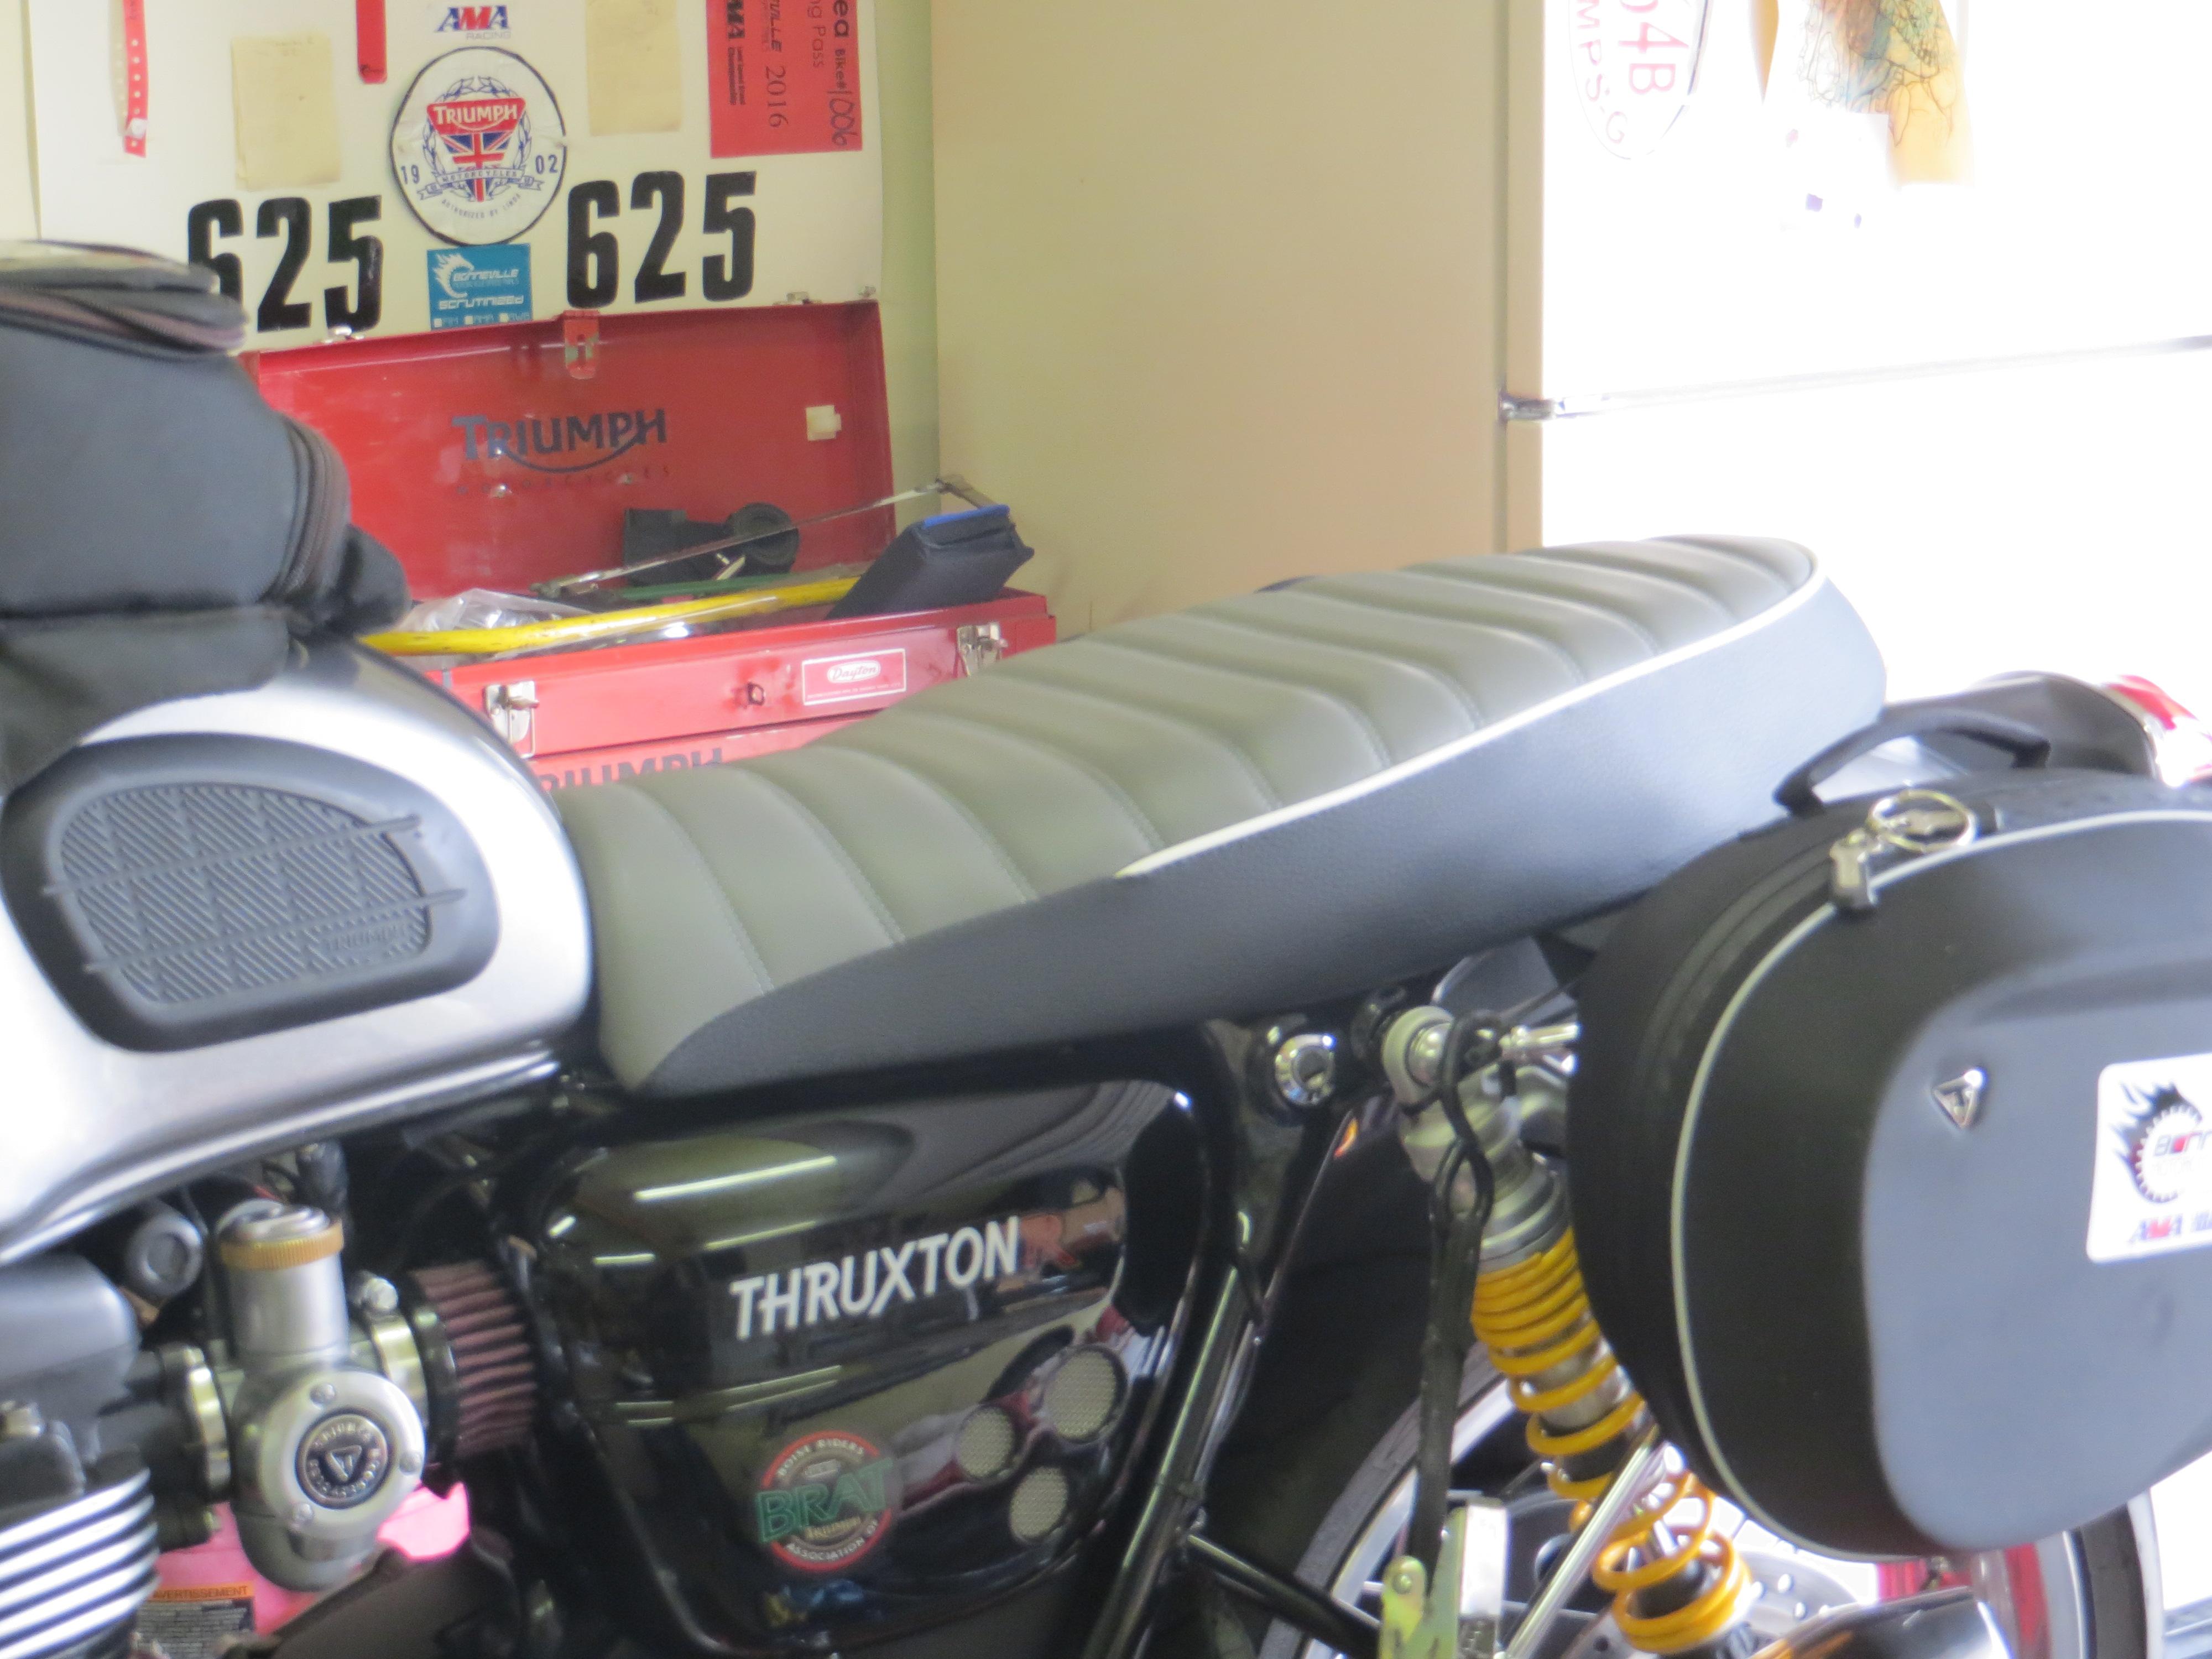 Thruxton W Corbin Bench Seat Triumph Forum Triumph Rat